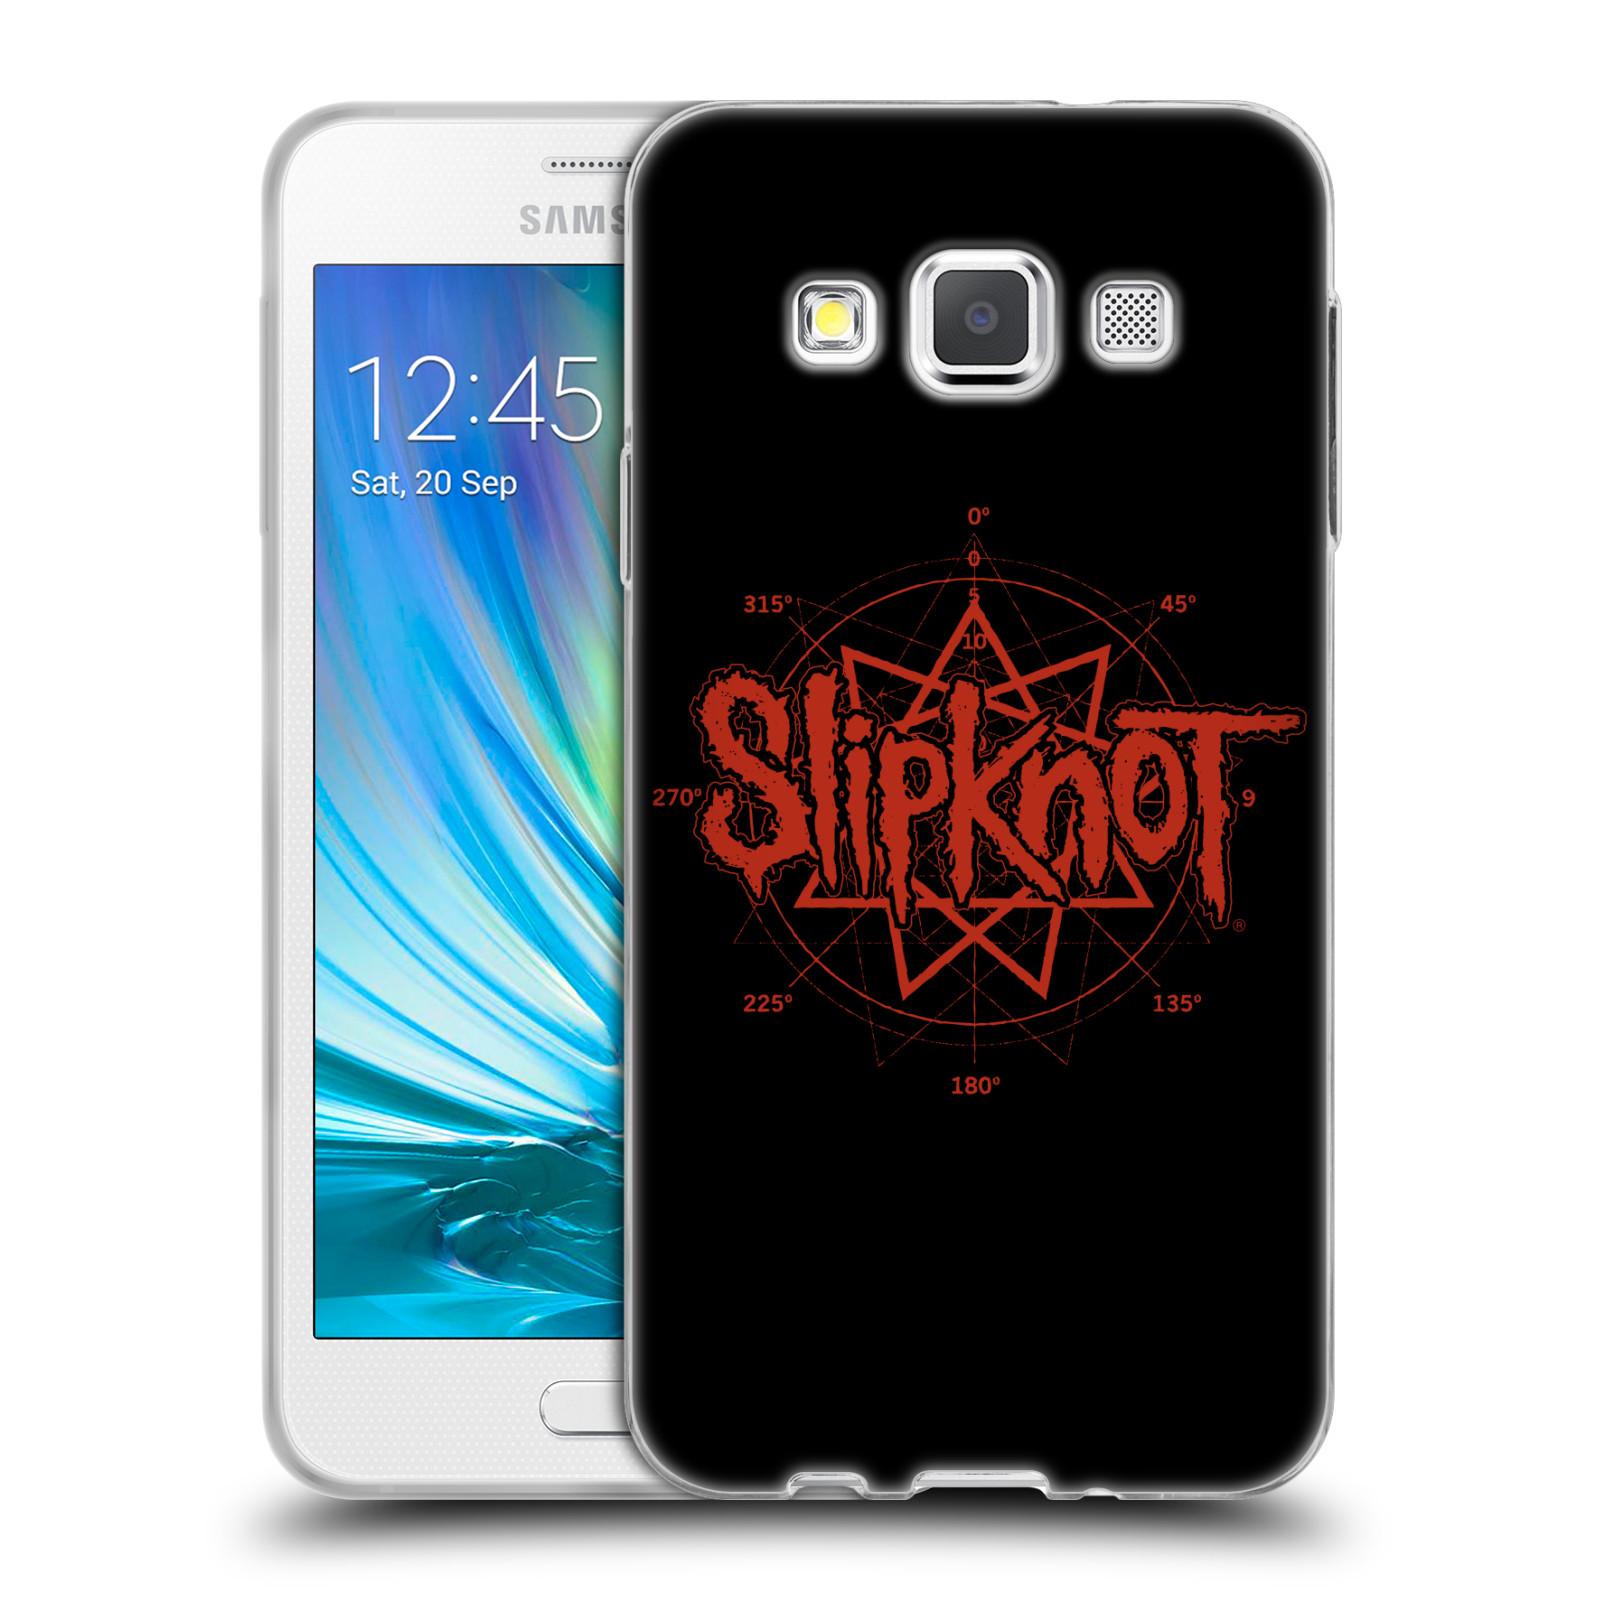 HEAD CASE silikonový obal na mobil Samsung Galaxy A3 (A300) hudební skupina Slipknot logo